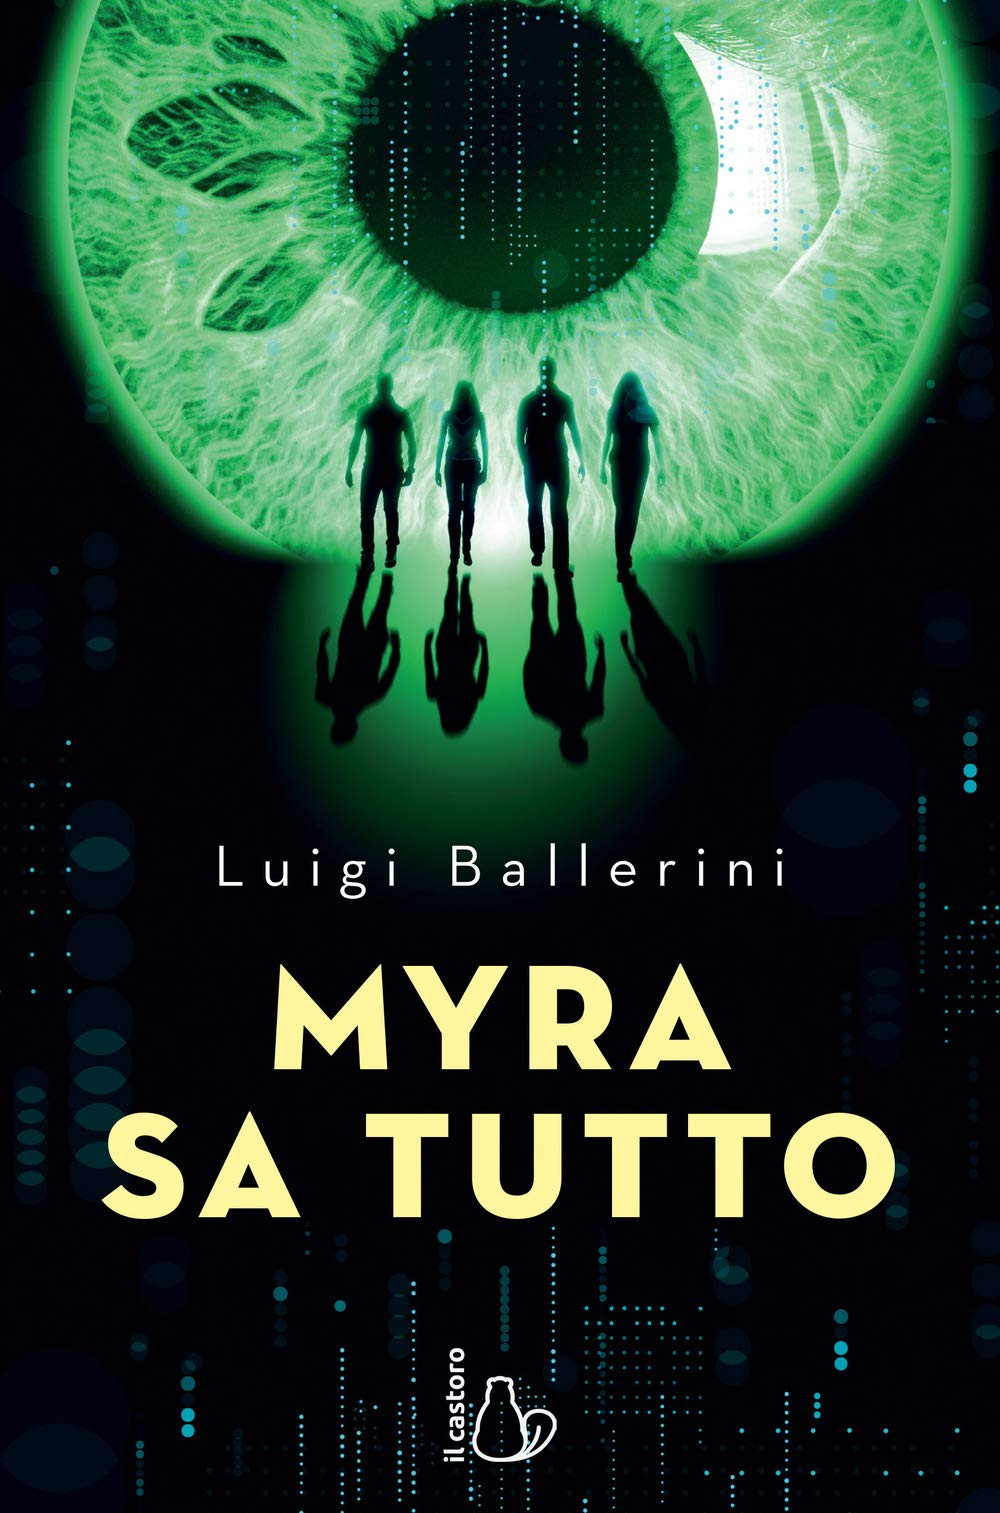 Myra sa tutto: Amazon.it: Ballerini, Luigi: Libri